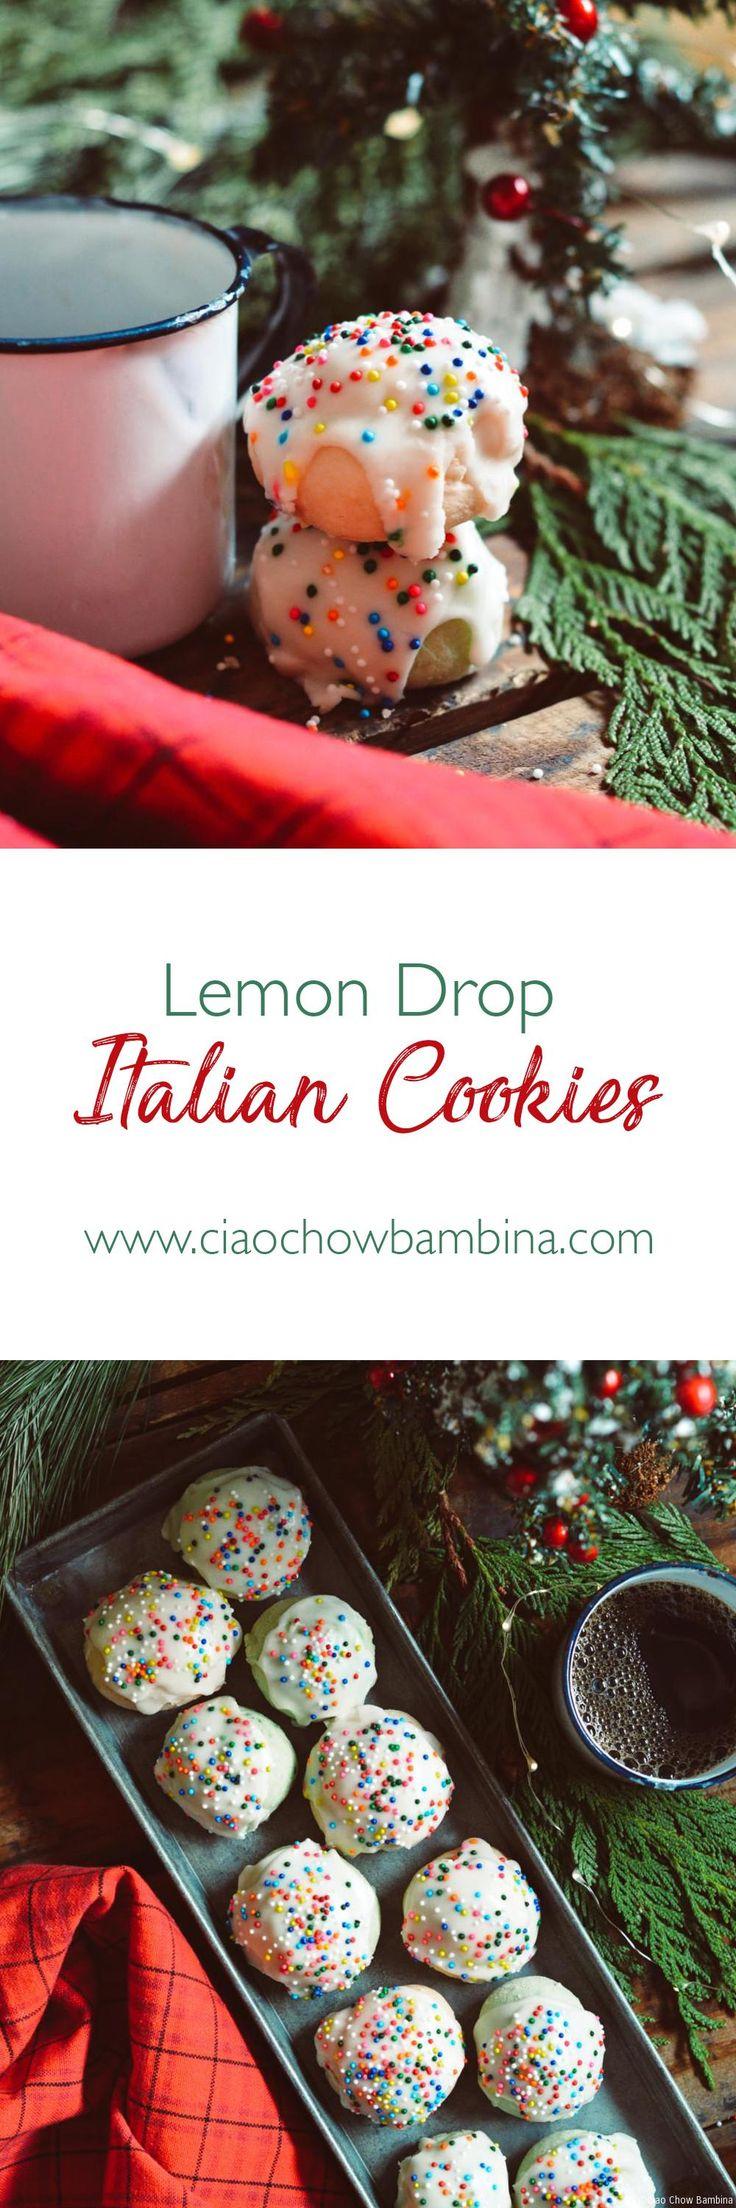 Lemon Drop Italian Cookies ciaochowbambina.com